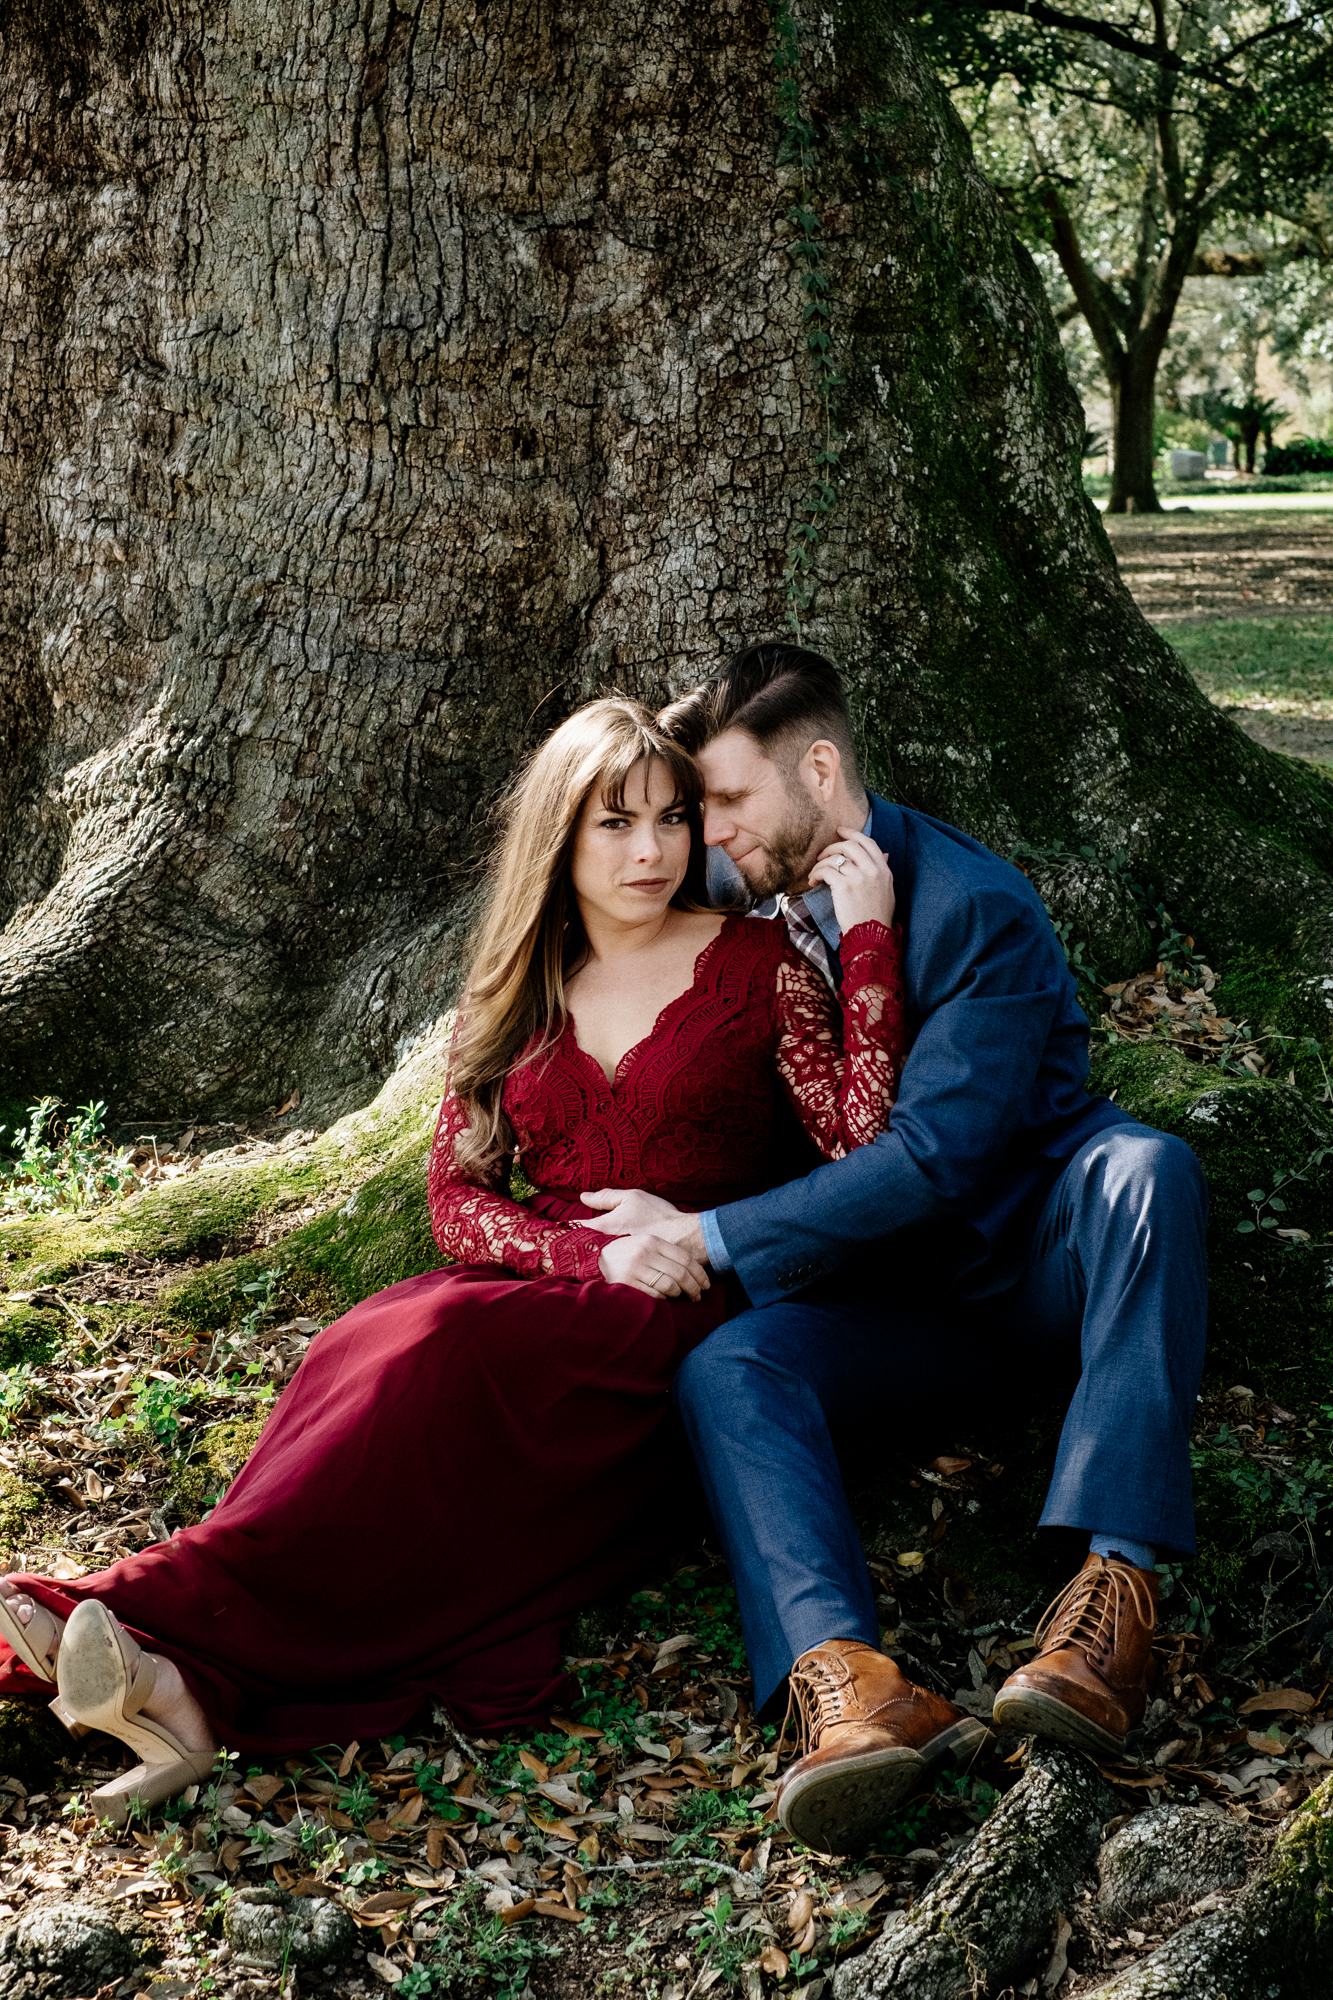 Jen_Montgomery_Photography_Angela_Brian_Engagement_Proposal_FB-150.jpg